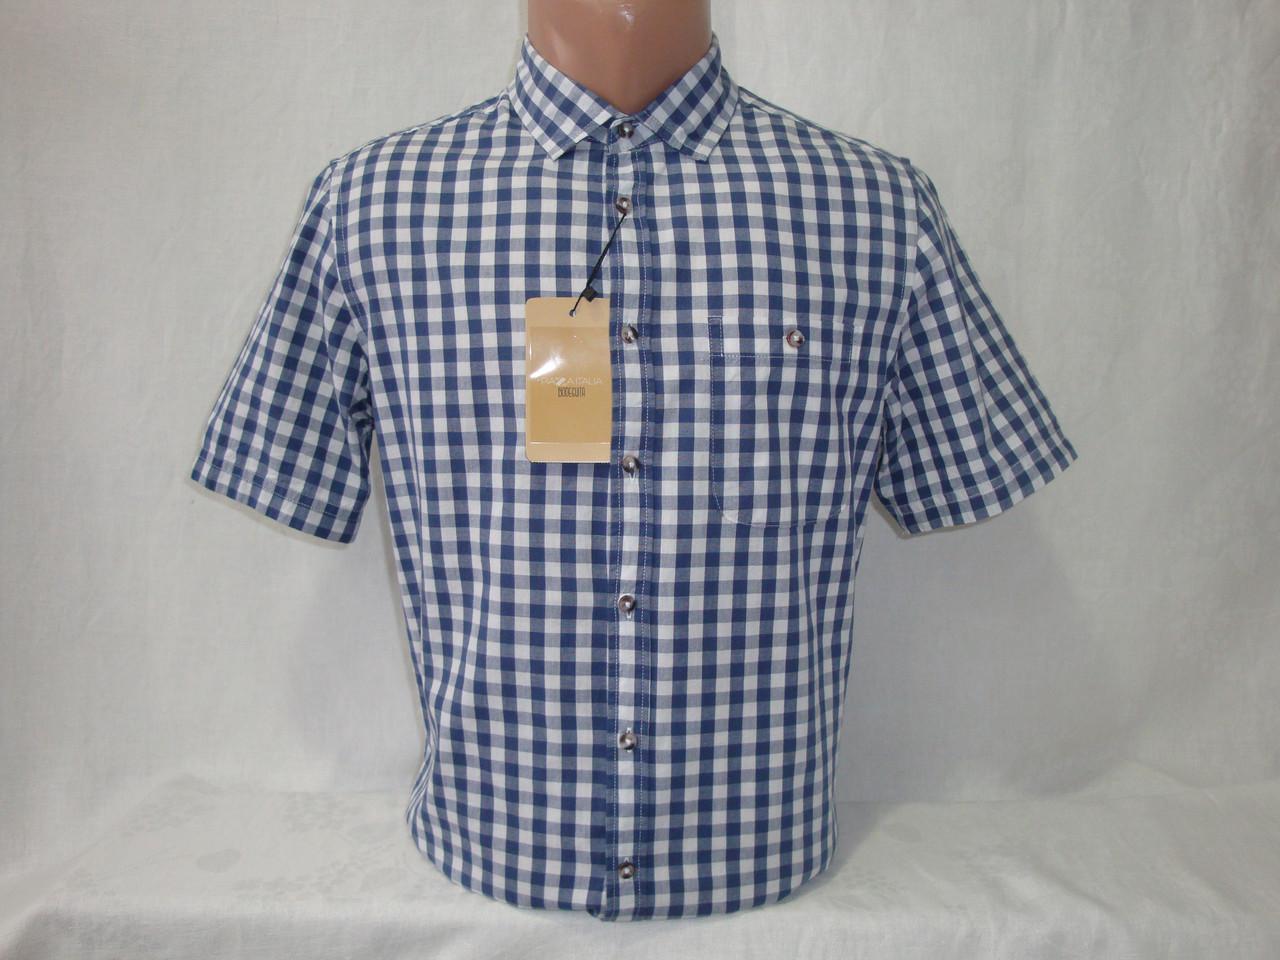 c71de0a4e80 Мужская рубашка в клетку с коротким рукавом Piazza Italia - Интернет-магазин